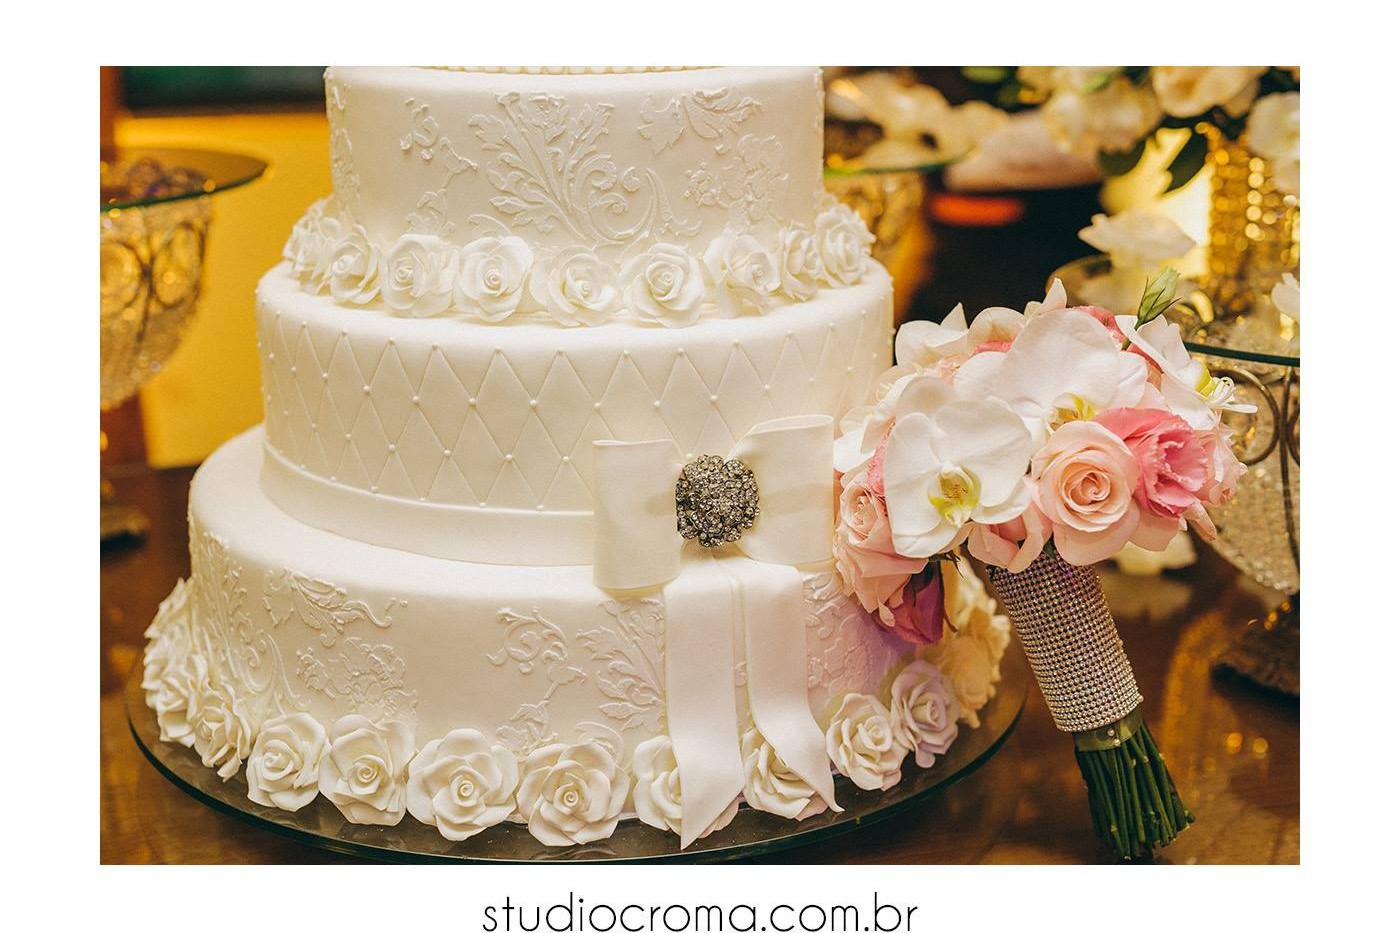 Buquê_Redondo_-_NATURAL_-_Créditos_Fot